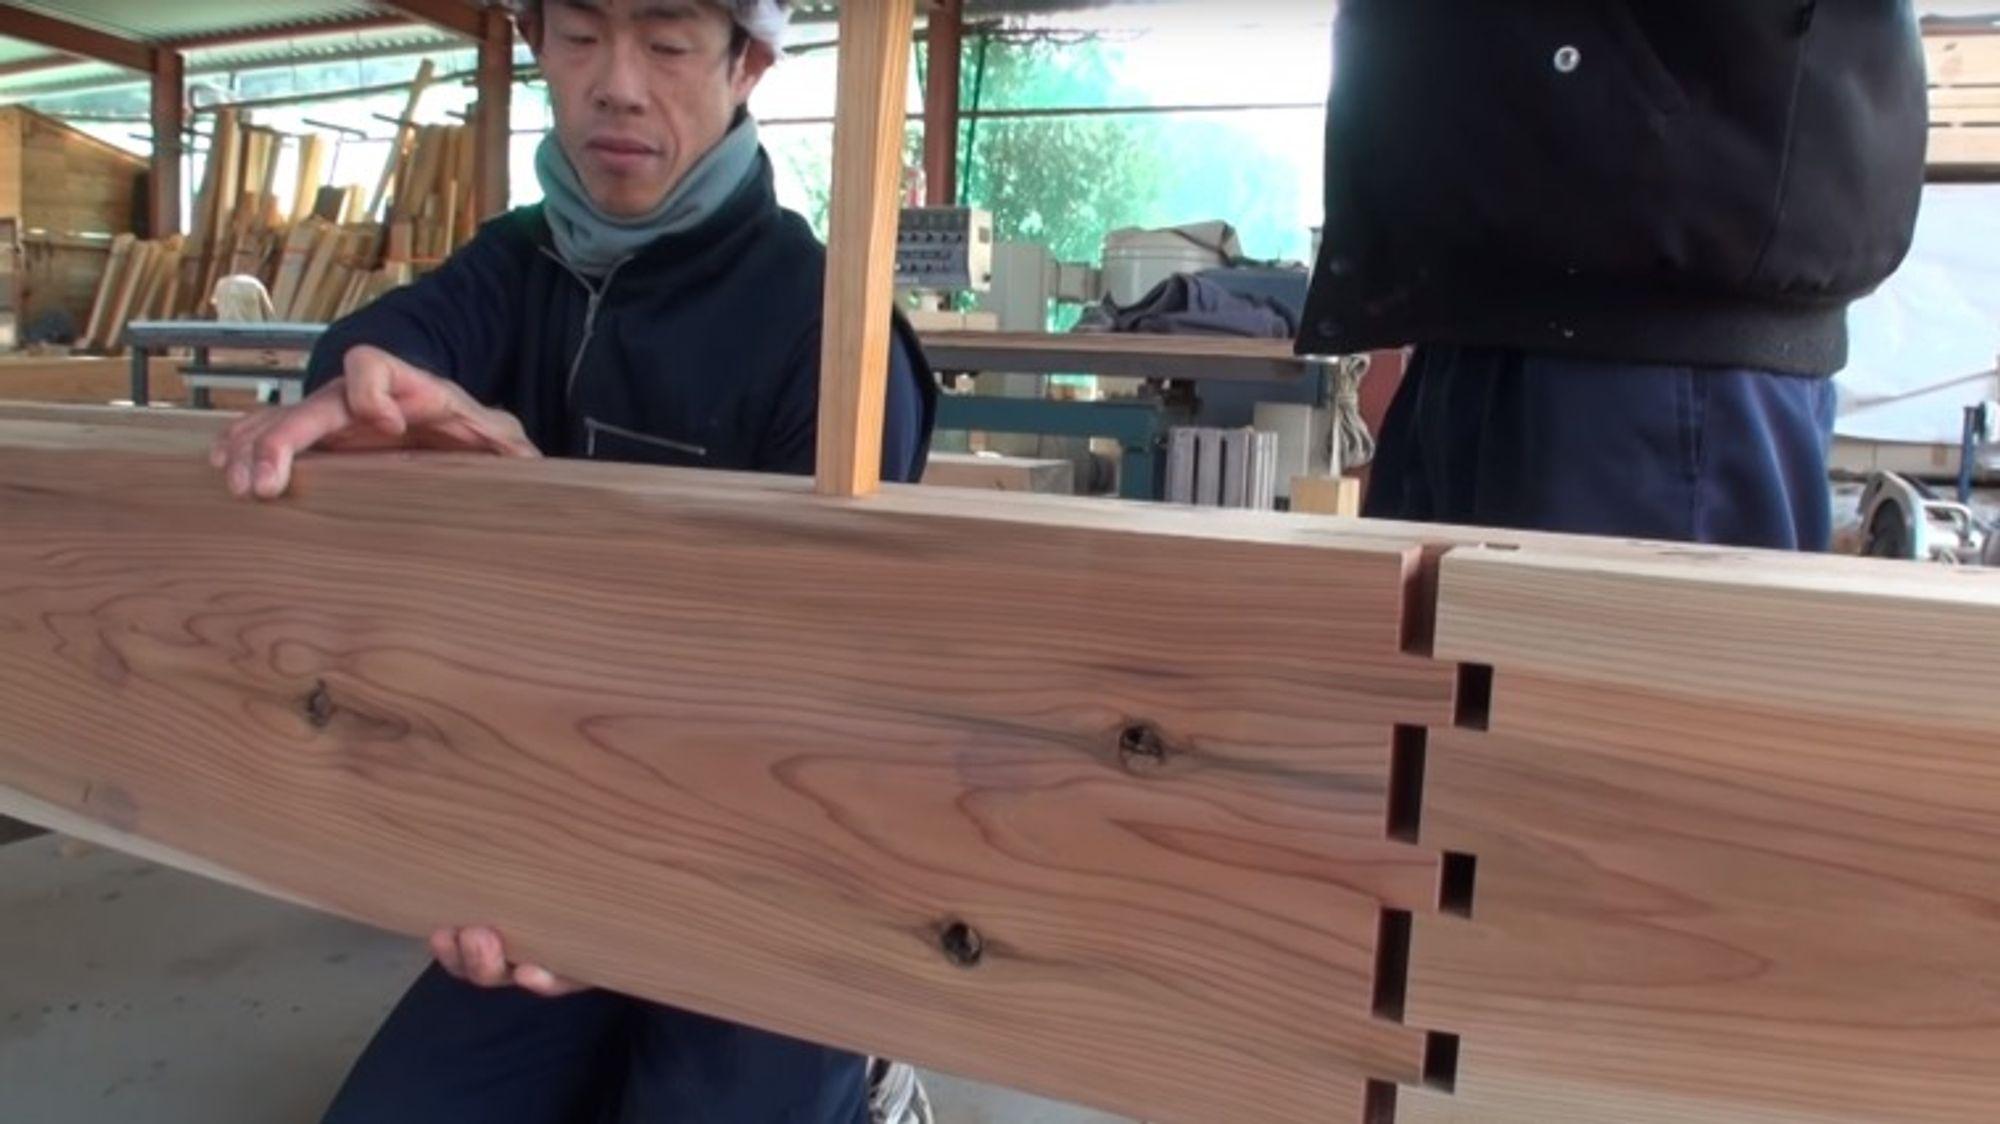 Foto: 次世代に繋ぐ伝統建築【先人の知恵を記憶する】/ Youtube